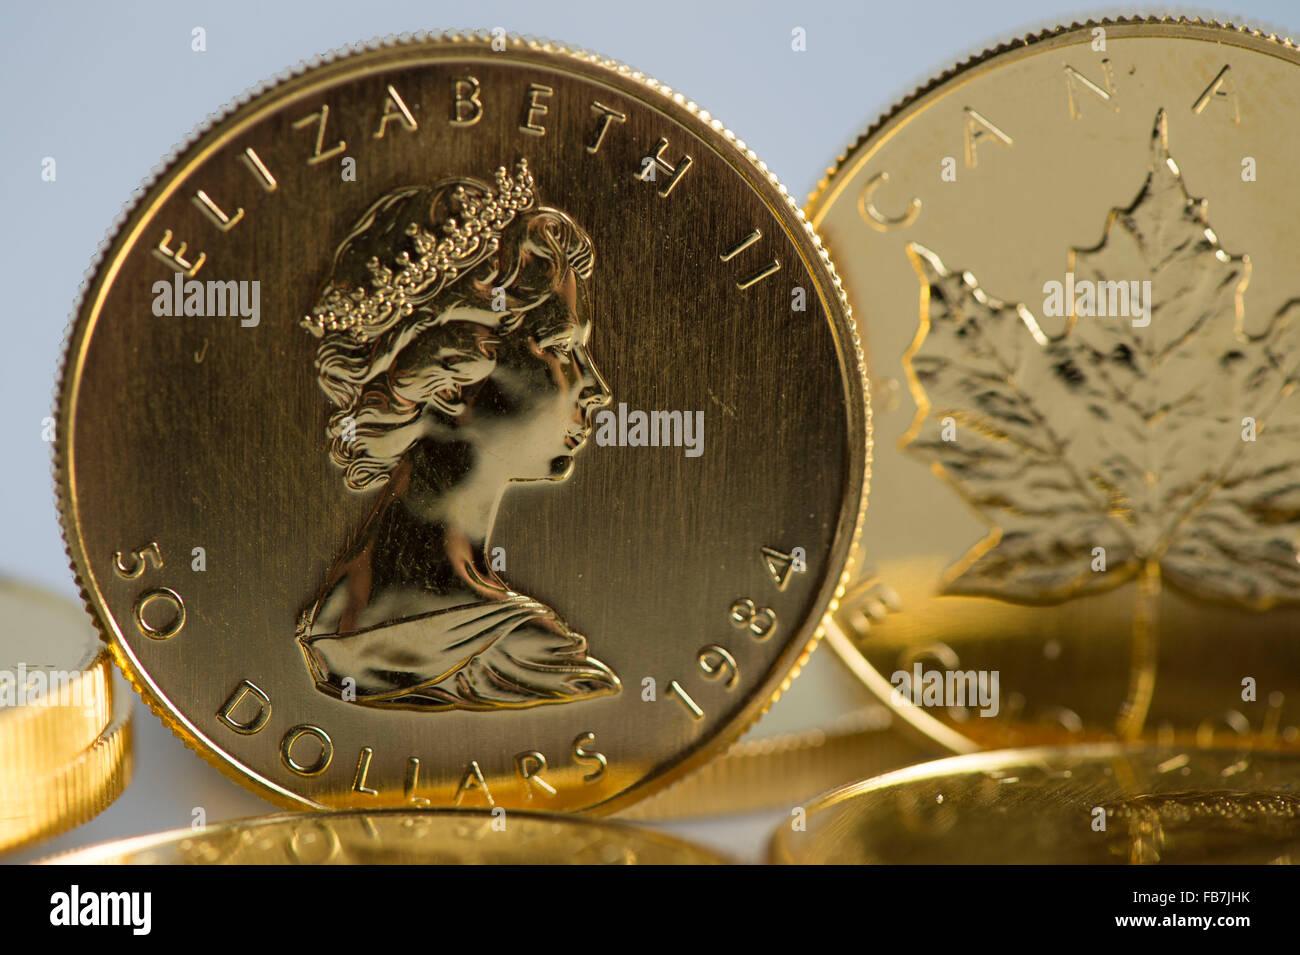 Eugene, Oregon, USA  11th Jan, 2016  One-ounce Canadian gold